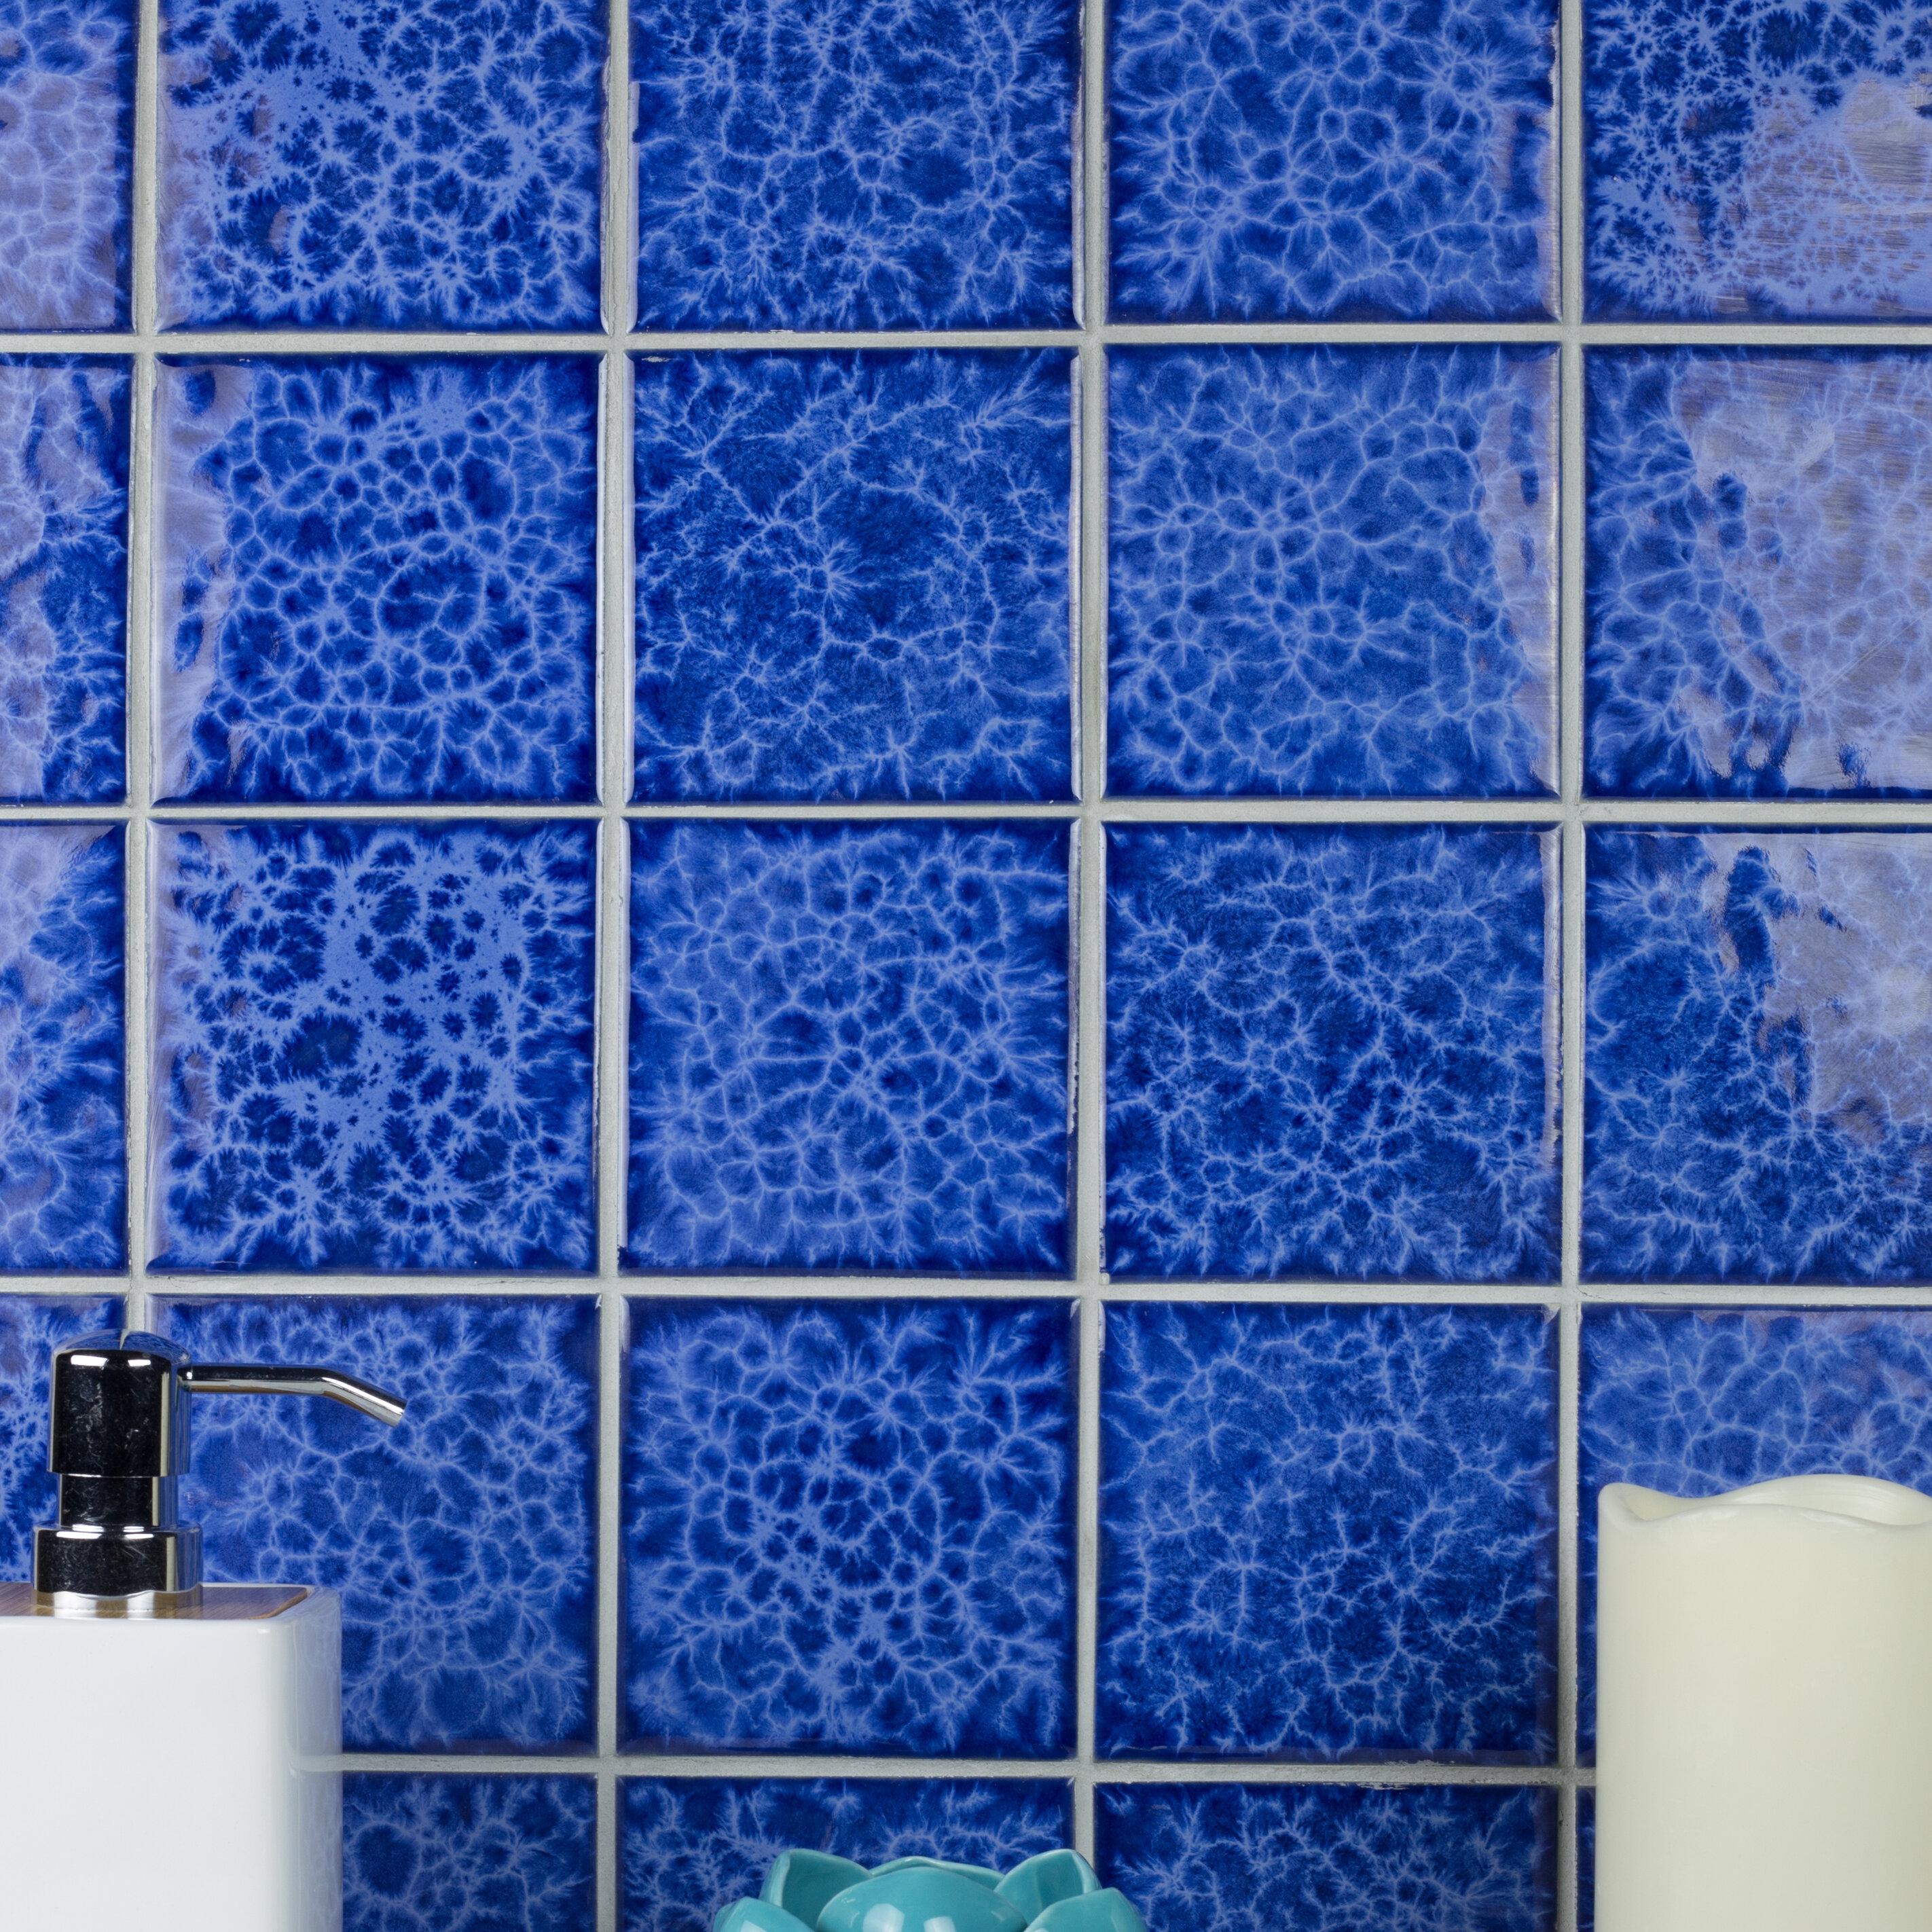 Monet Swimming Pool Series 3.7 x 3.7 Porcelain Square Mosaic Tile